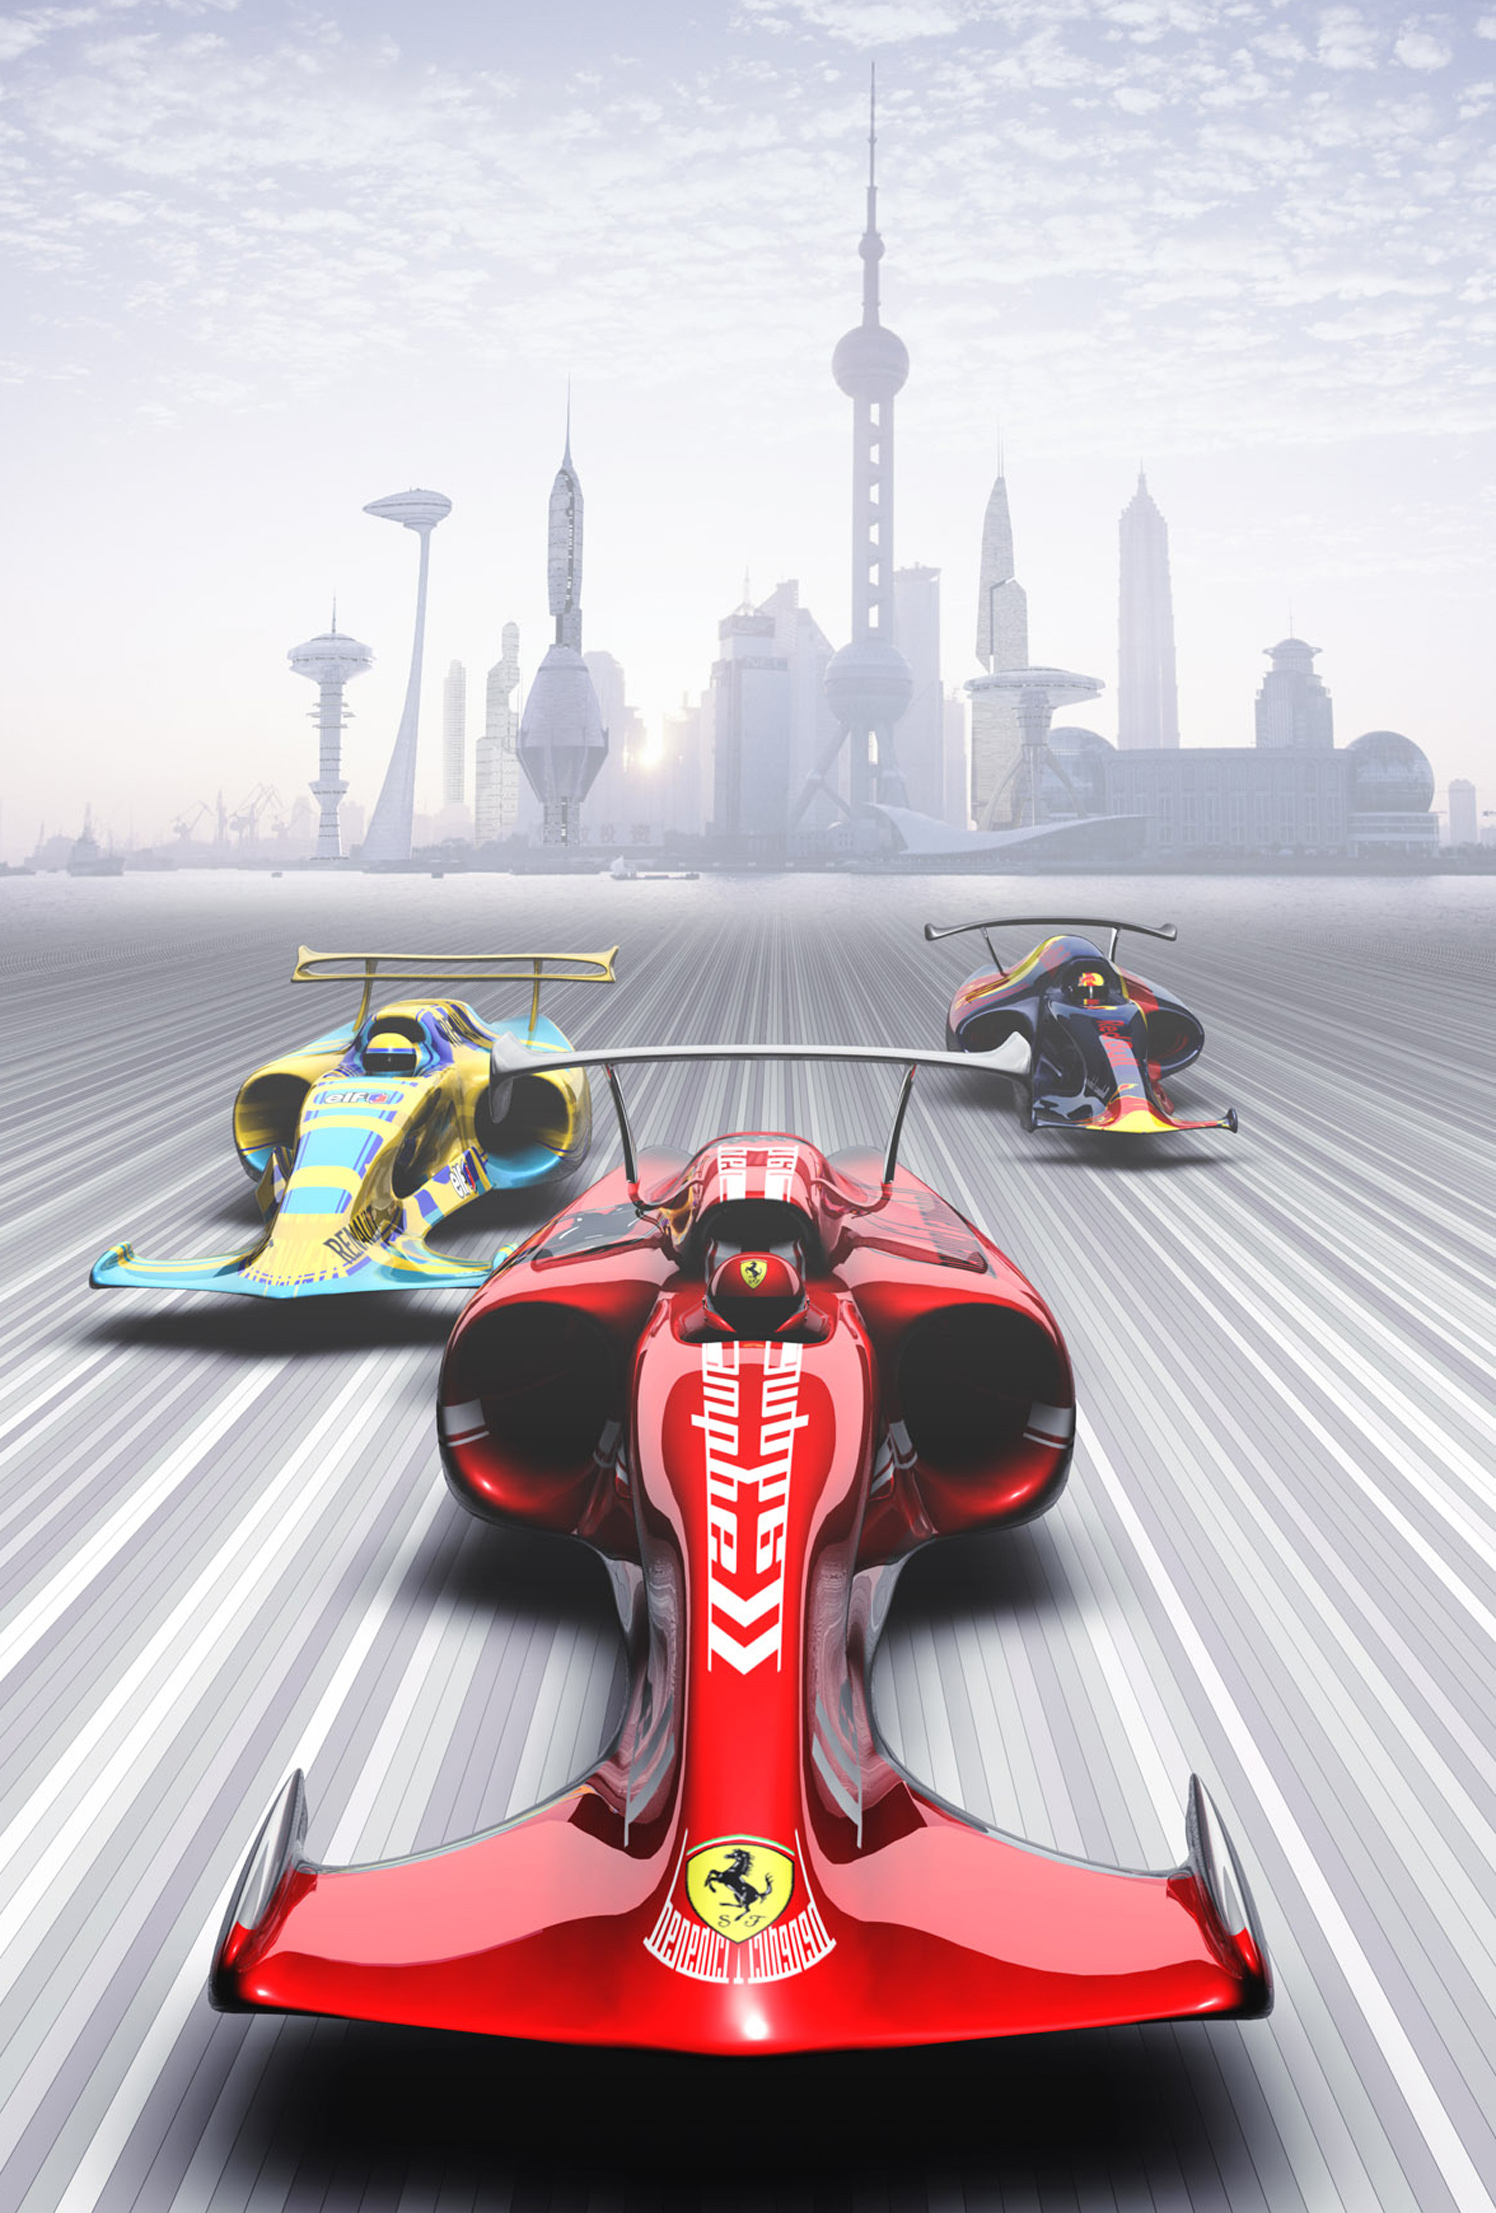 the future of f1